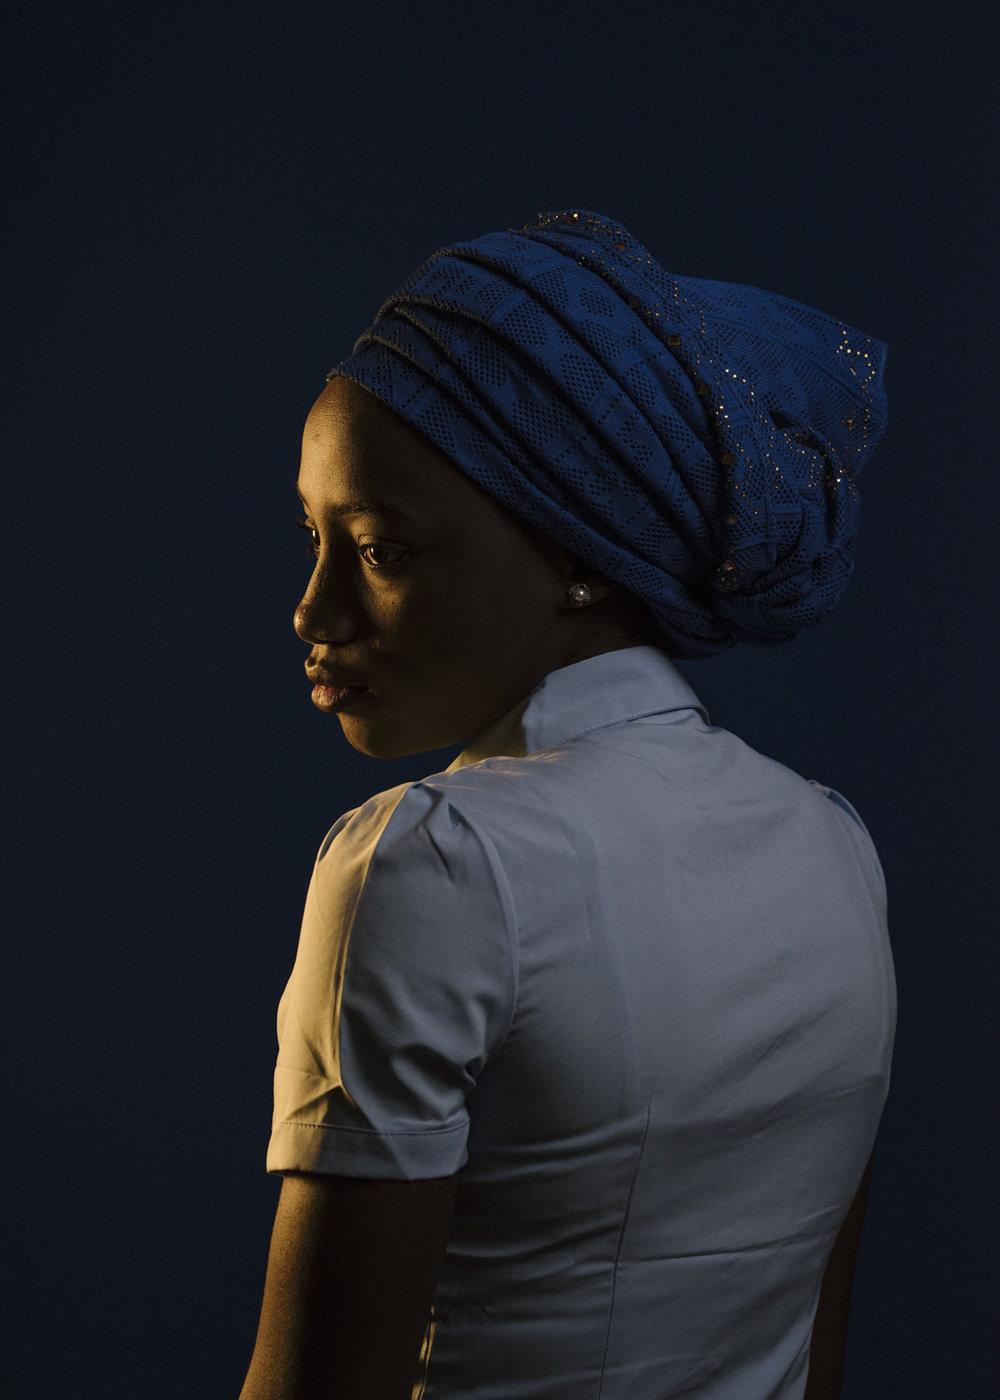 Rahab Ibrahim, 'Chibok Girl' for  The New York Times